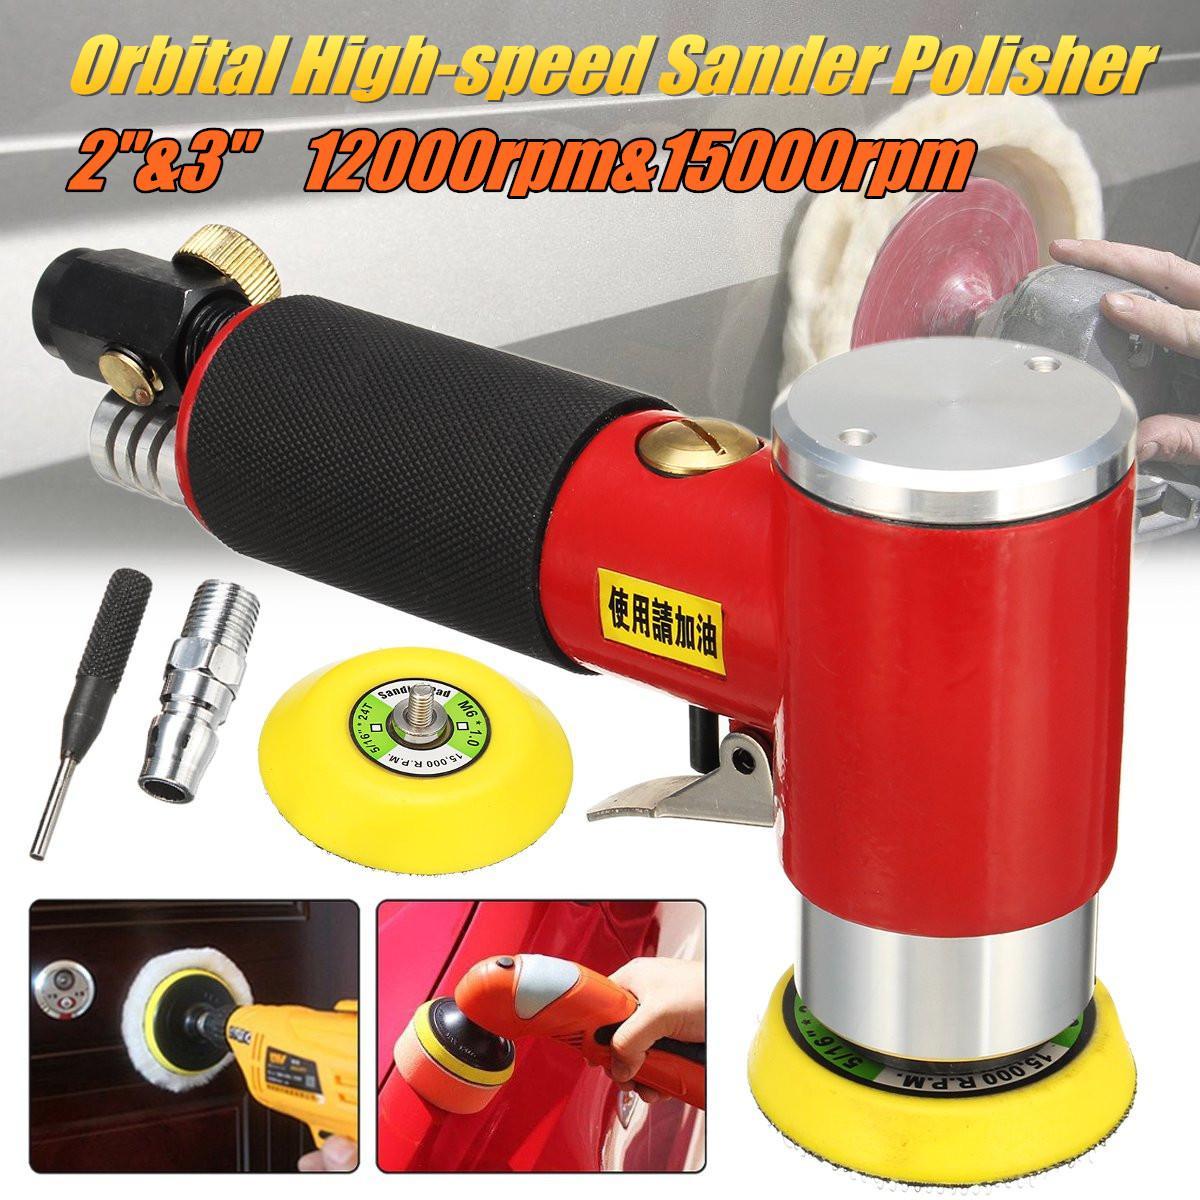 2 3 Mini Pneumatic Sanding Machine Tray Orbital High speed Sander Polisher For Various Materials Grinding